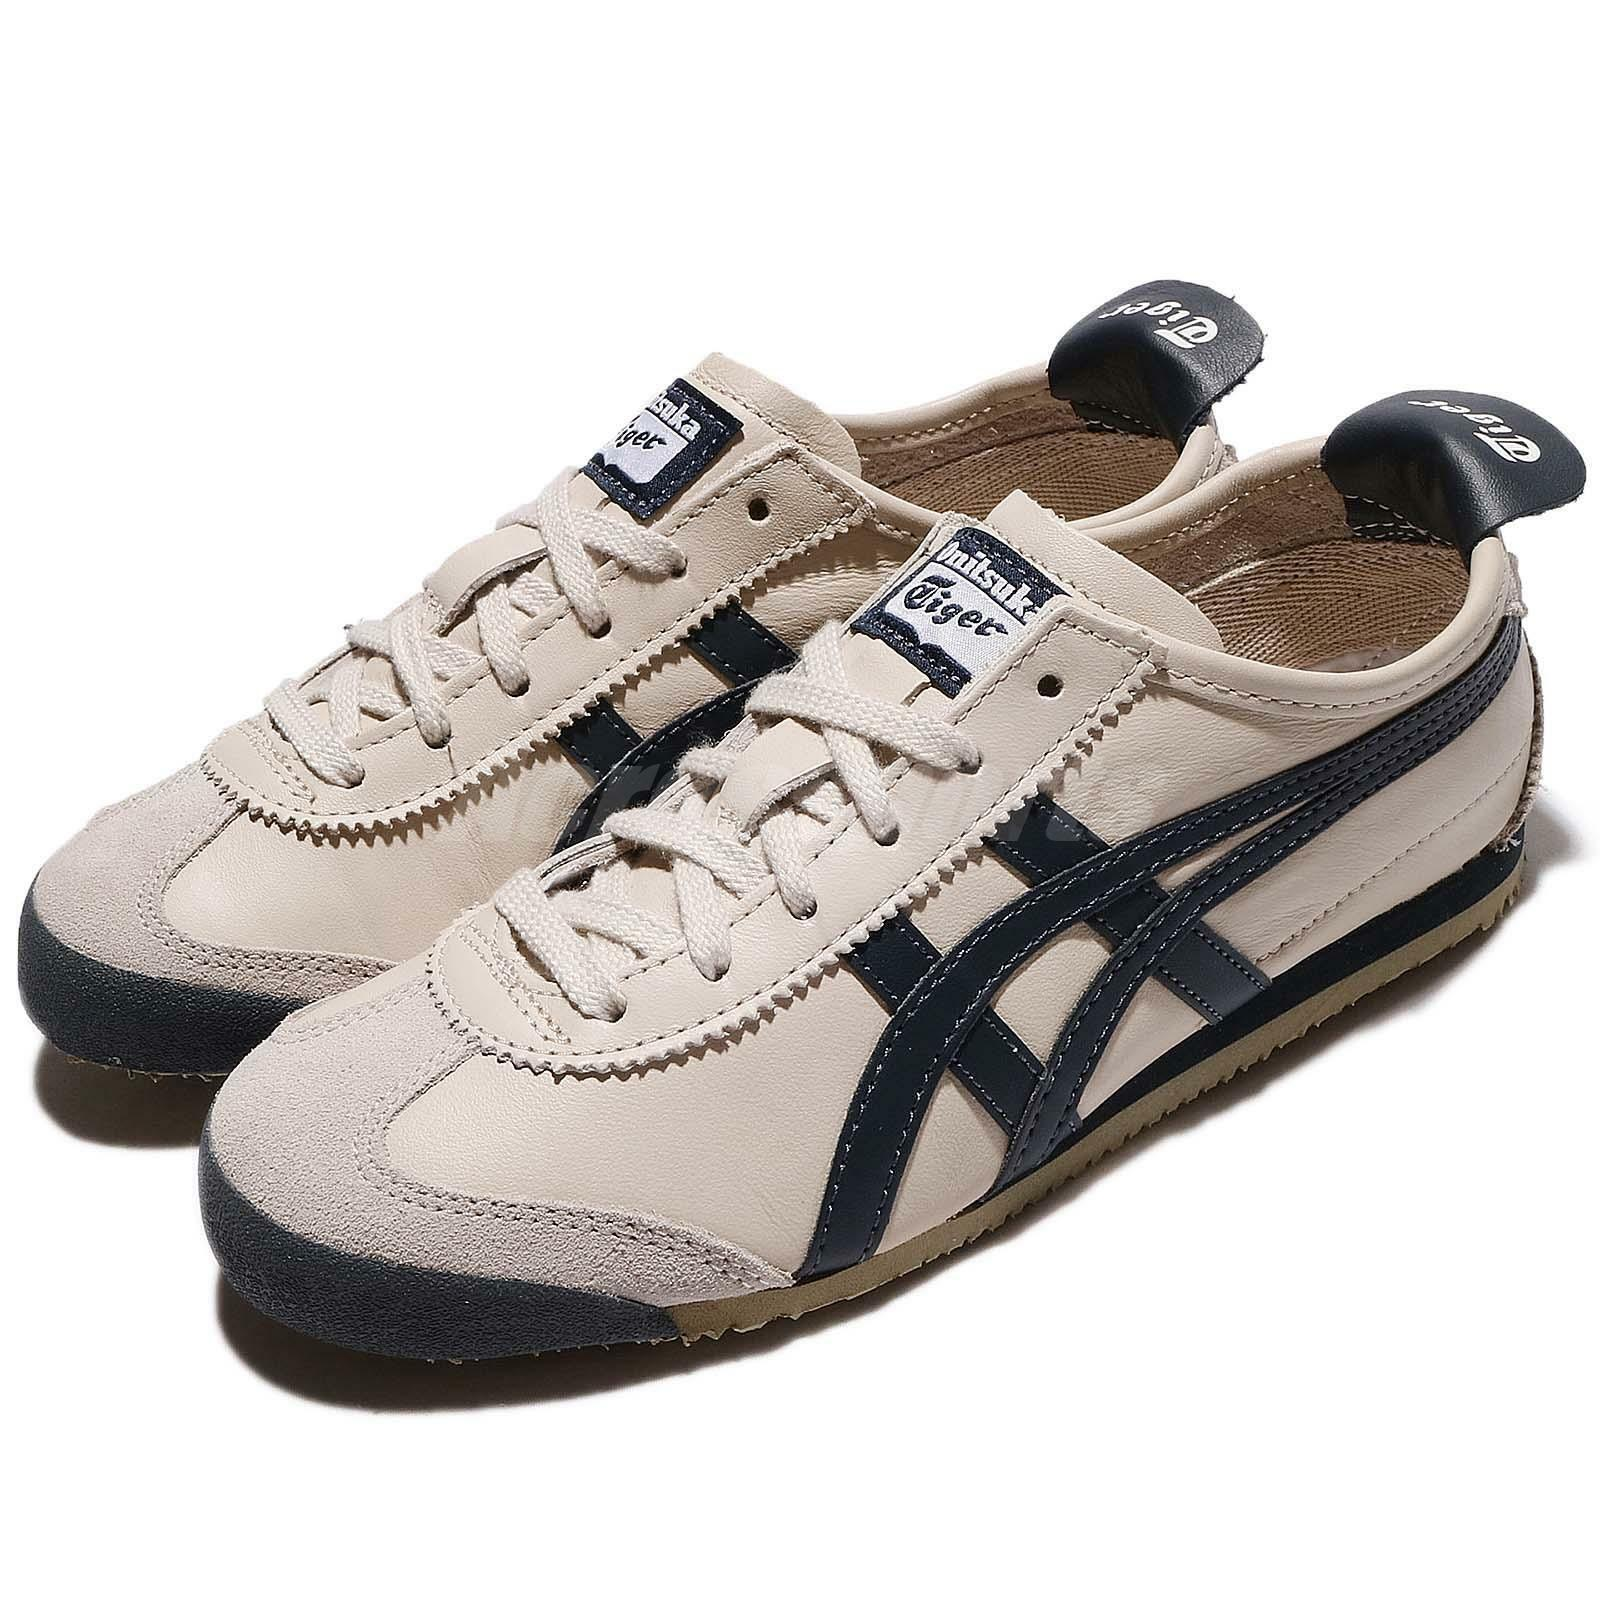 Asics Mexico Onitsuka Tiger 66 Birch India Ink Latte Men Shoe Sneaker DL408-1659